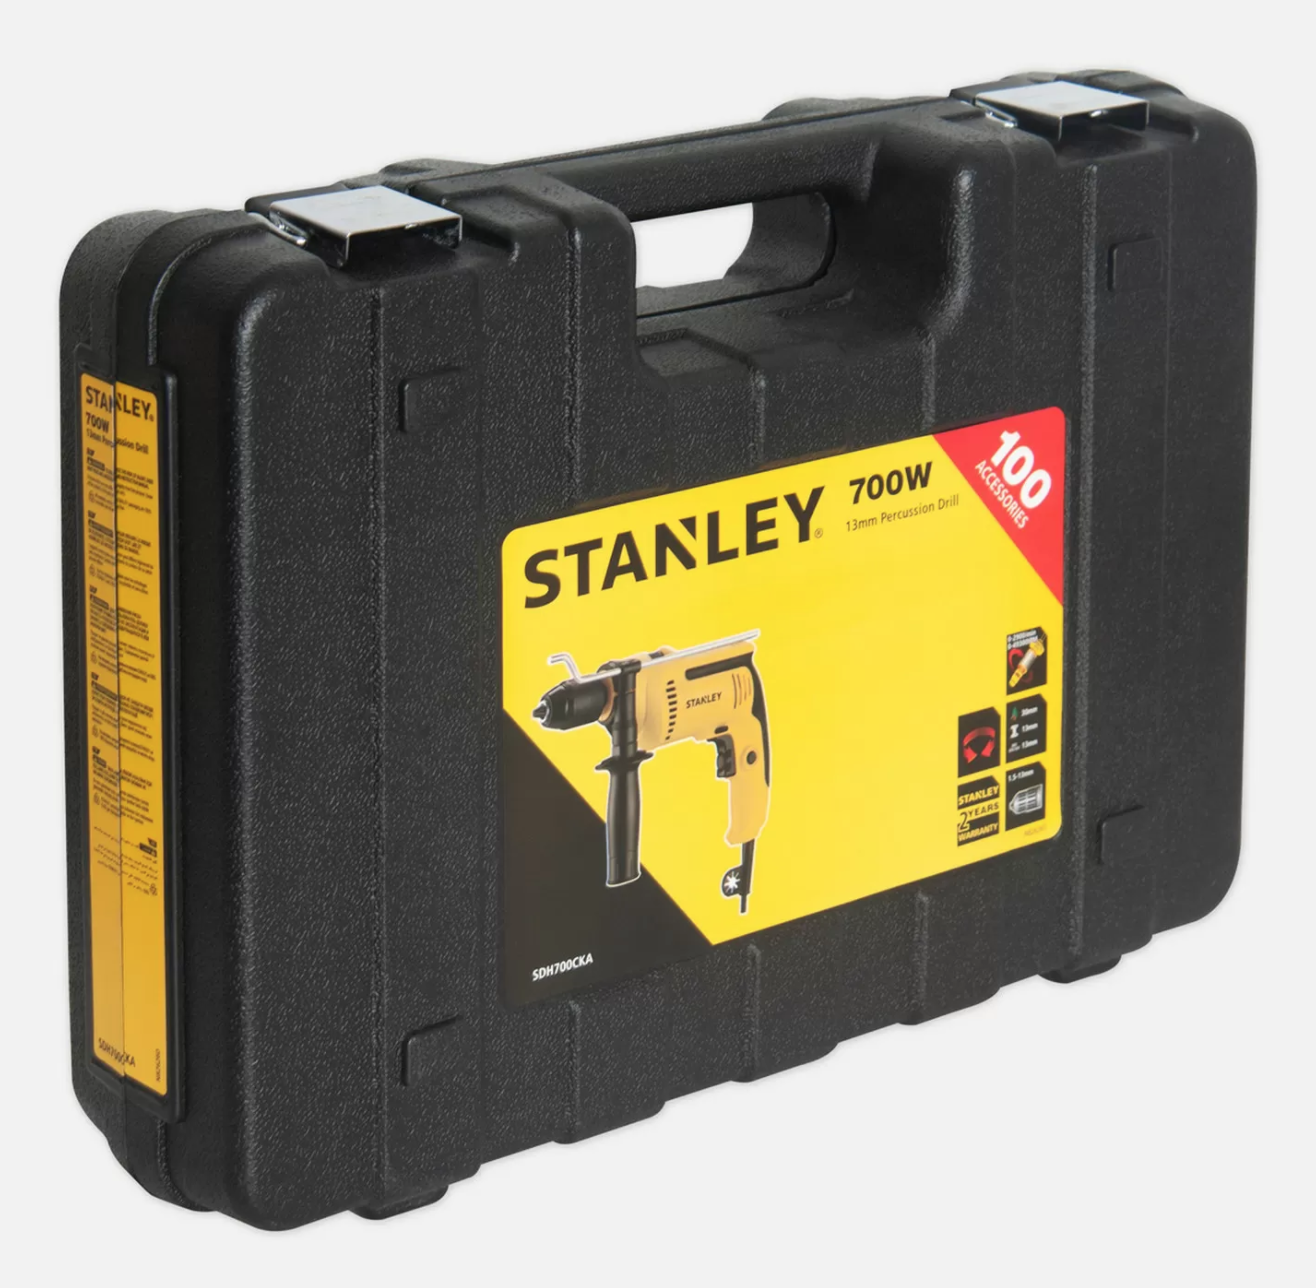 Stanley 700W 13mm Darbeli Matkap (100 Parça Aksesuar Hediyeli) SDH700CKA